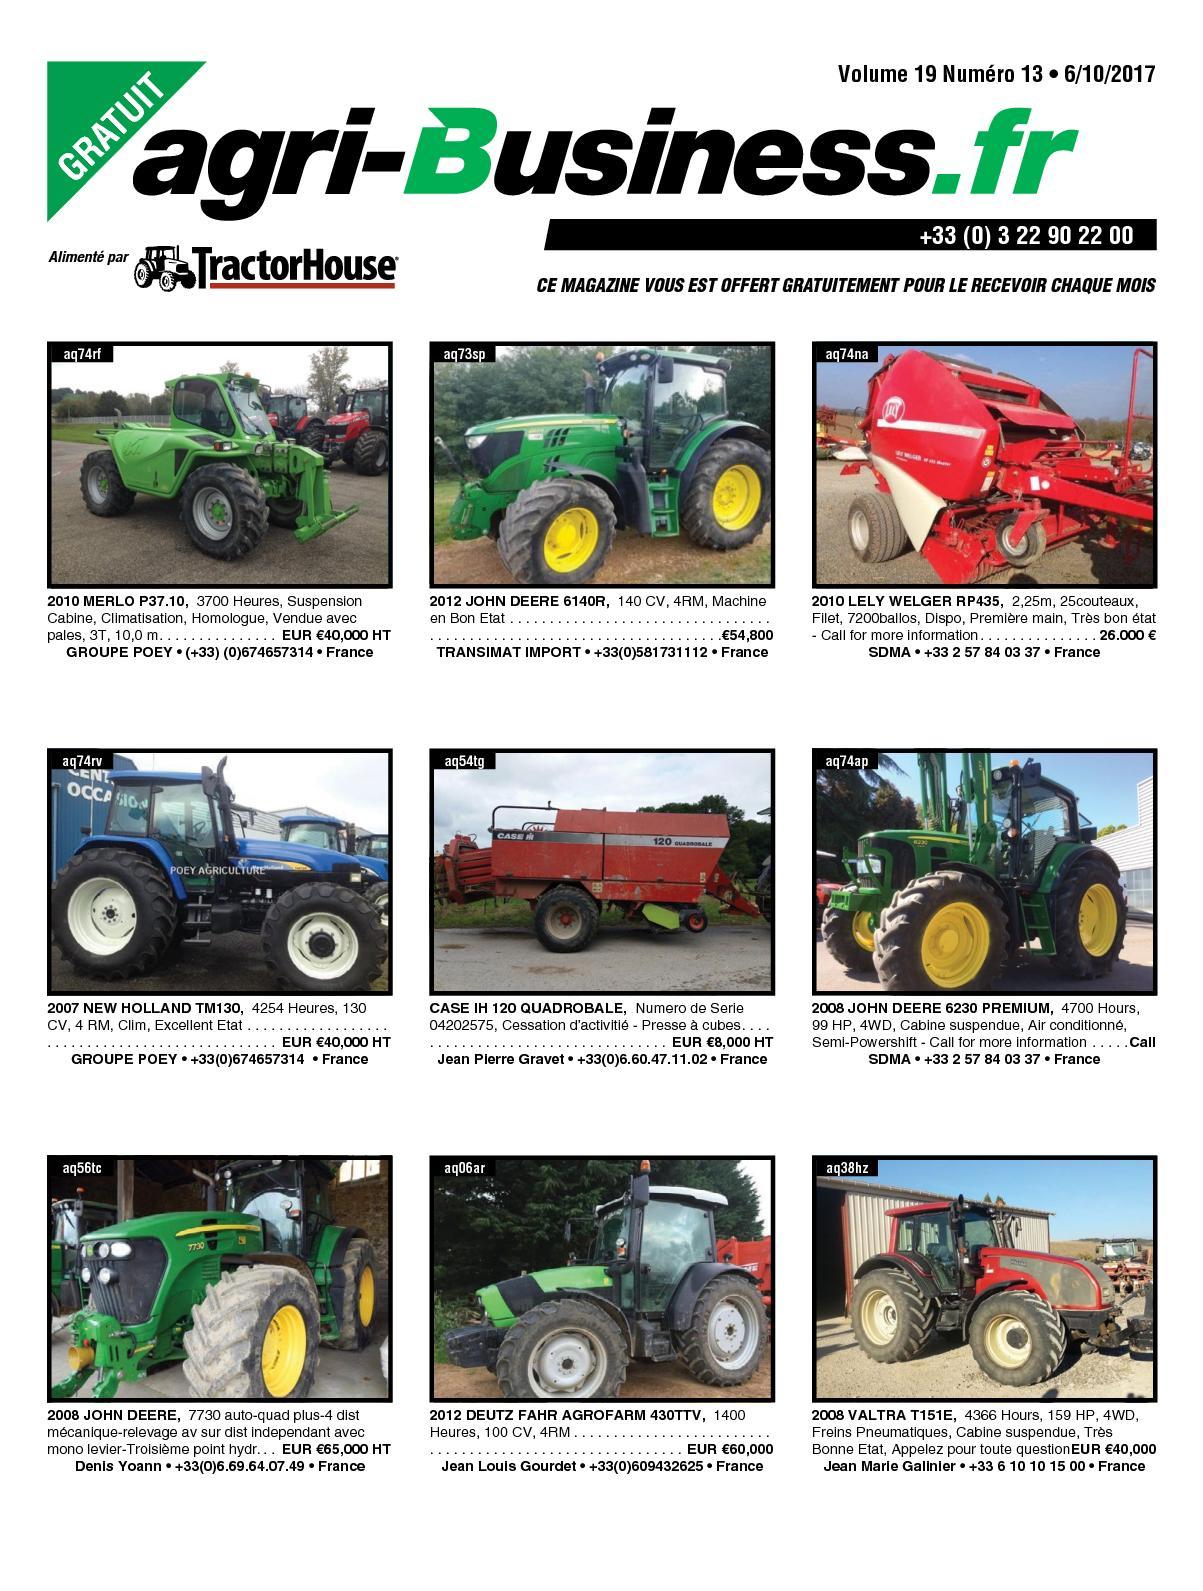 Calaméo Agri Business Volume 19 Numéro 13 06 10 2017